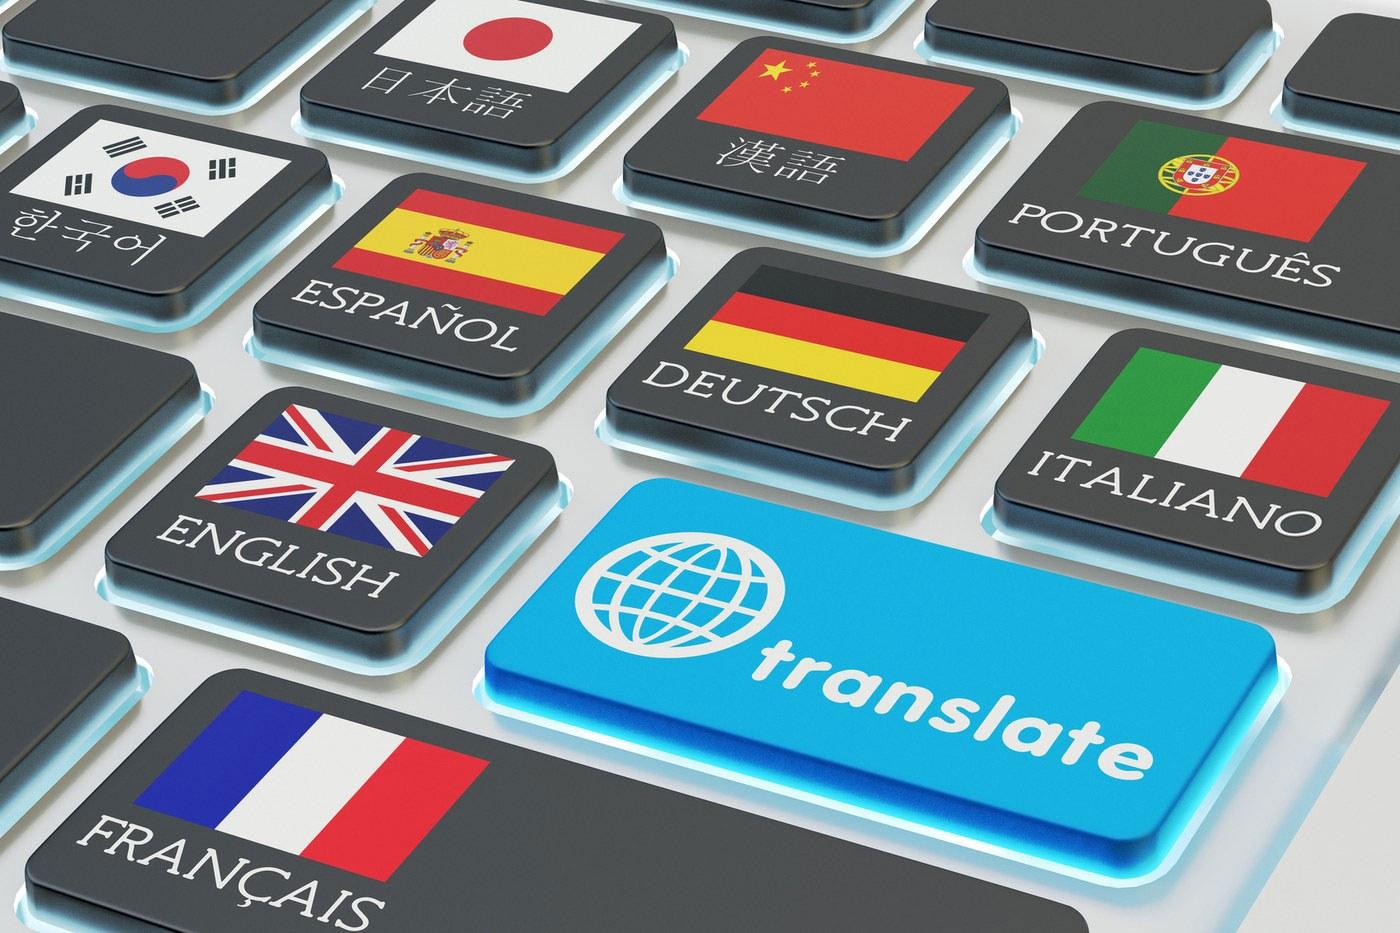 International Translation Day 2019 - Latest quotes, wishes, poem